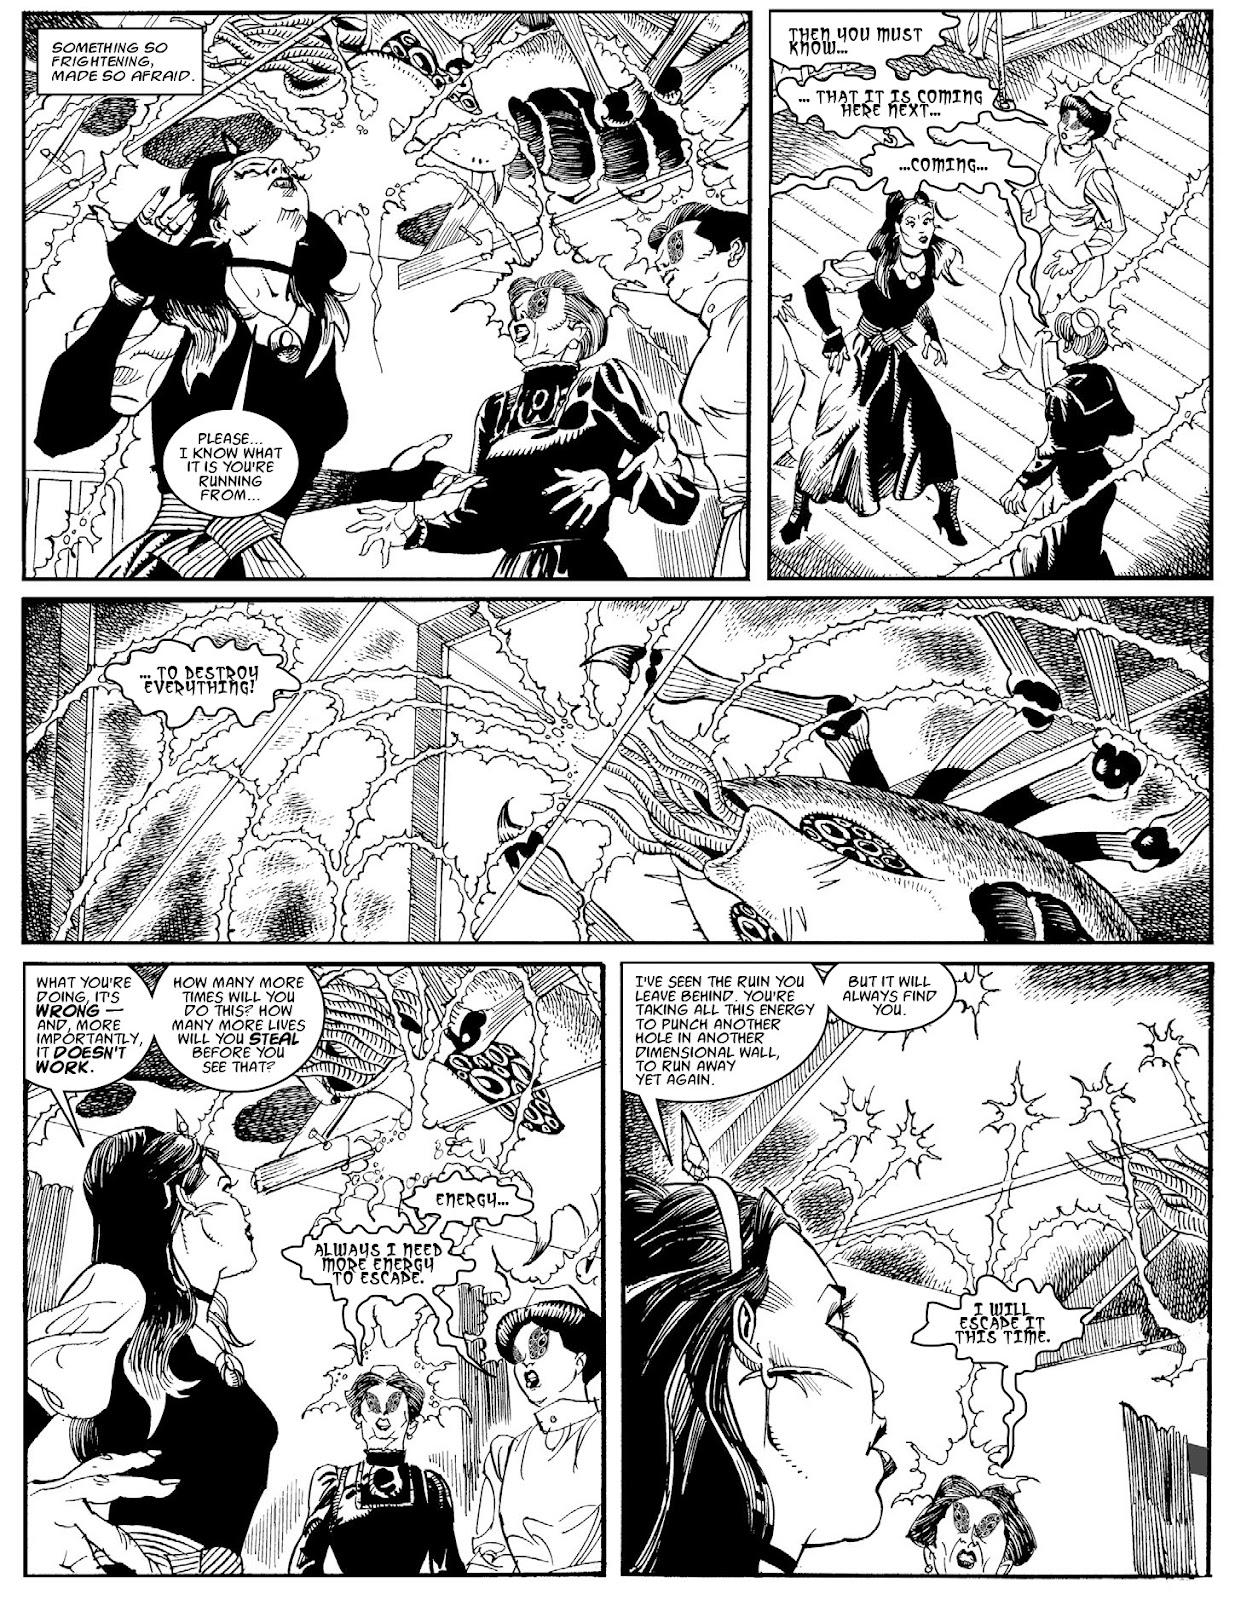 Judge Dredd Megazine (Vol. 5) issue 427 - Page 73